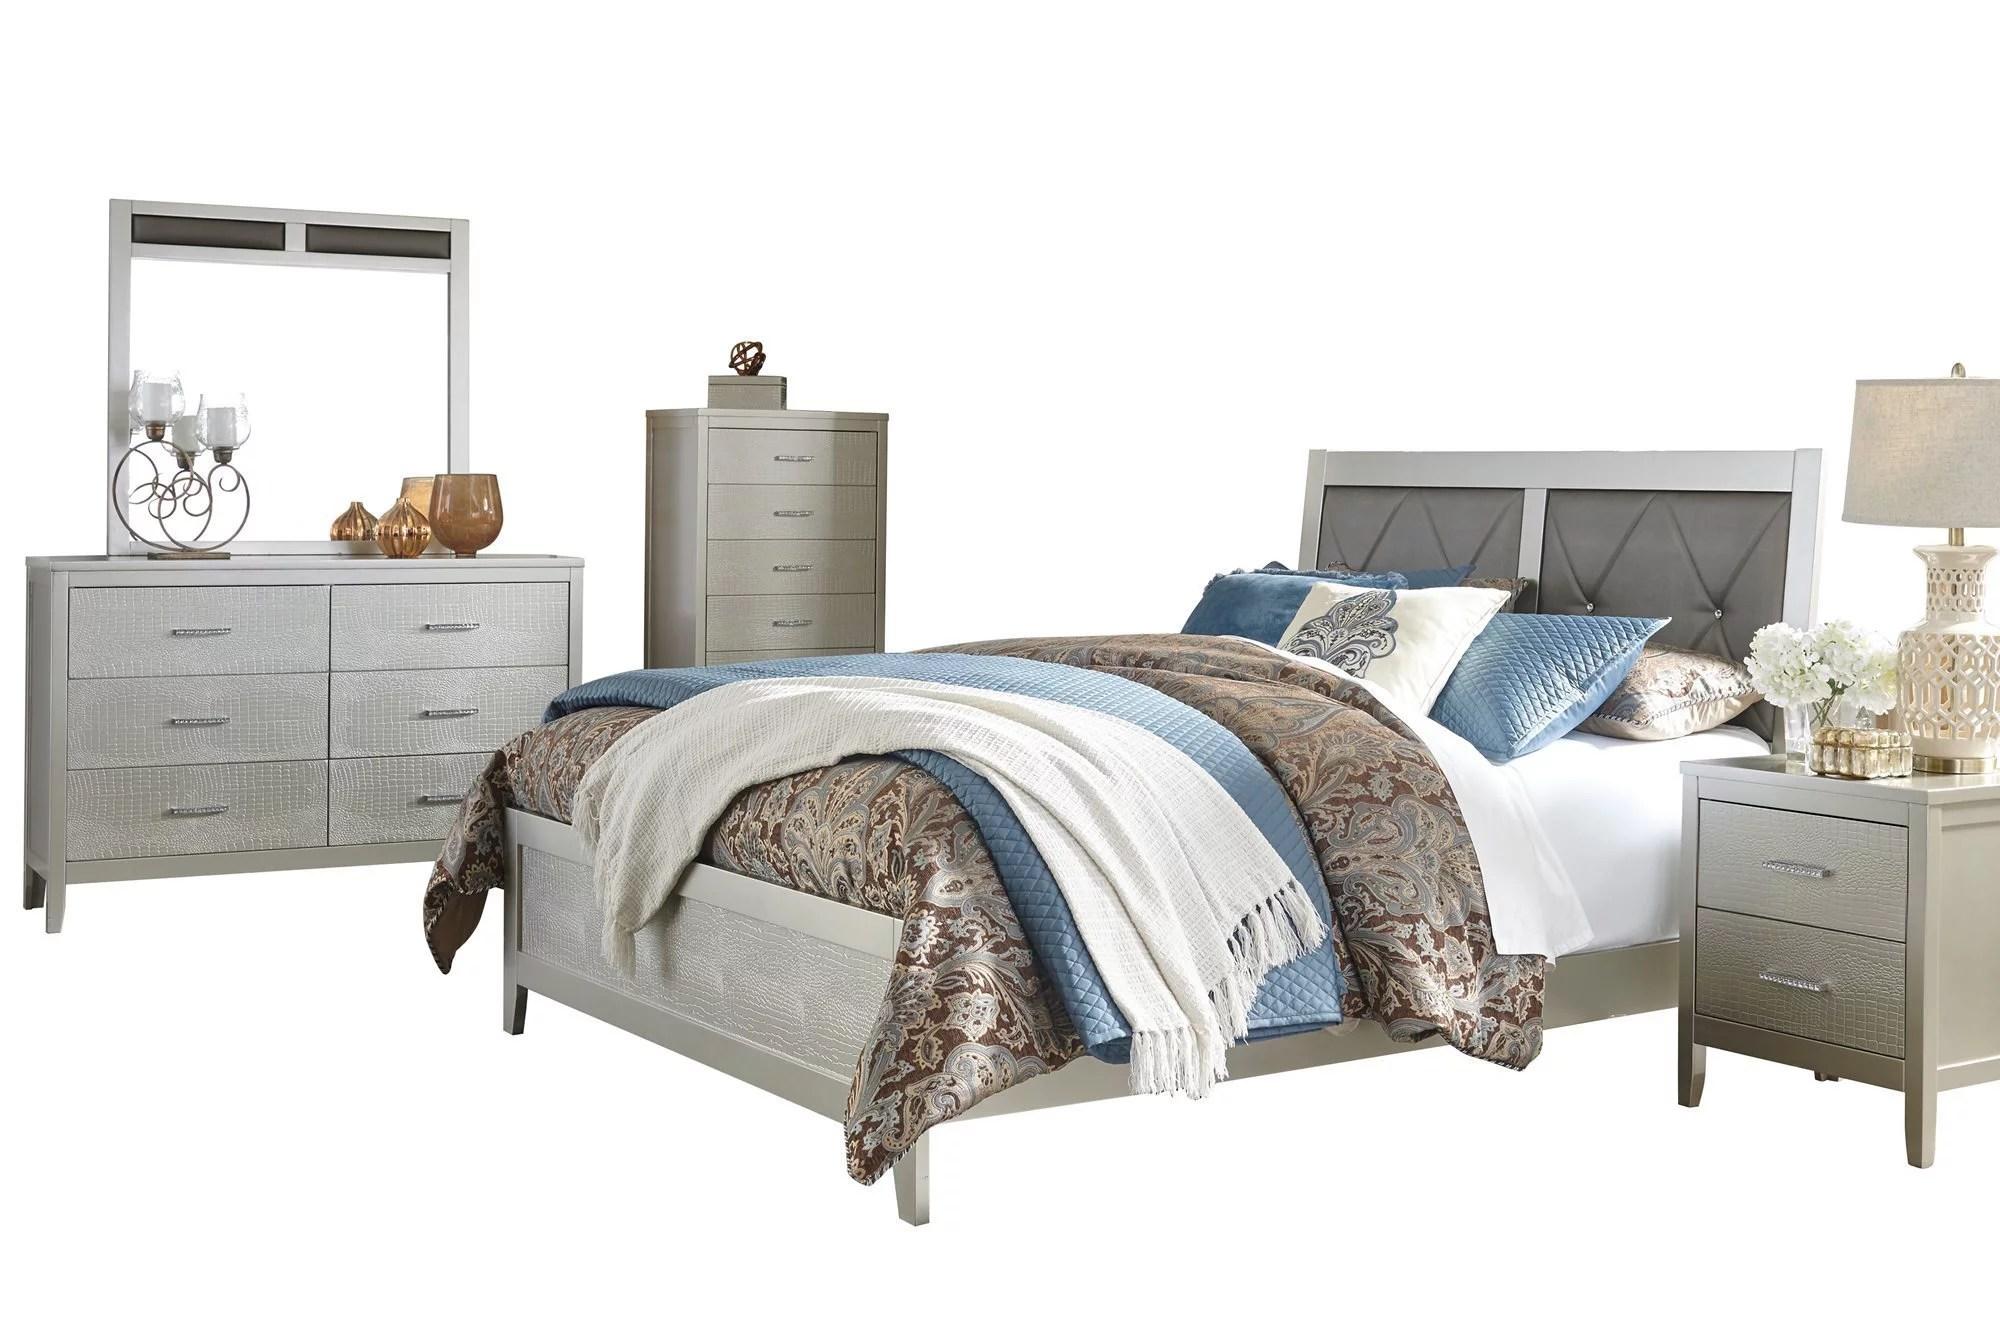 ashley furniture olivet 5 pc bedroom set queen panel bed 1 nightstand dresser mirror chest silver